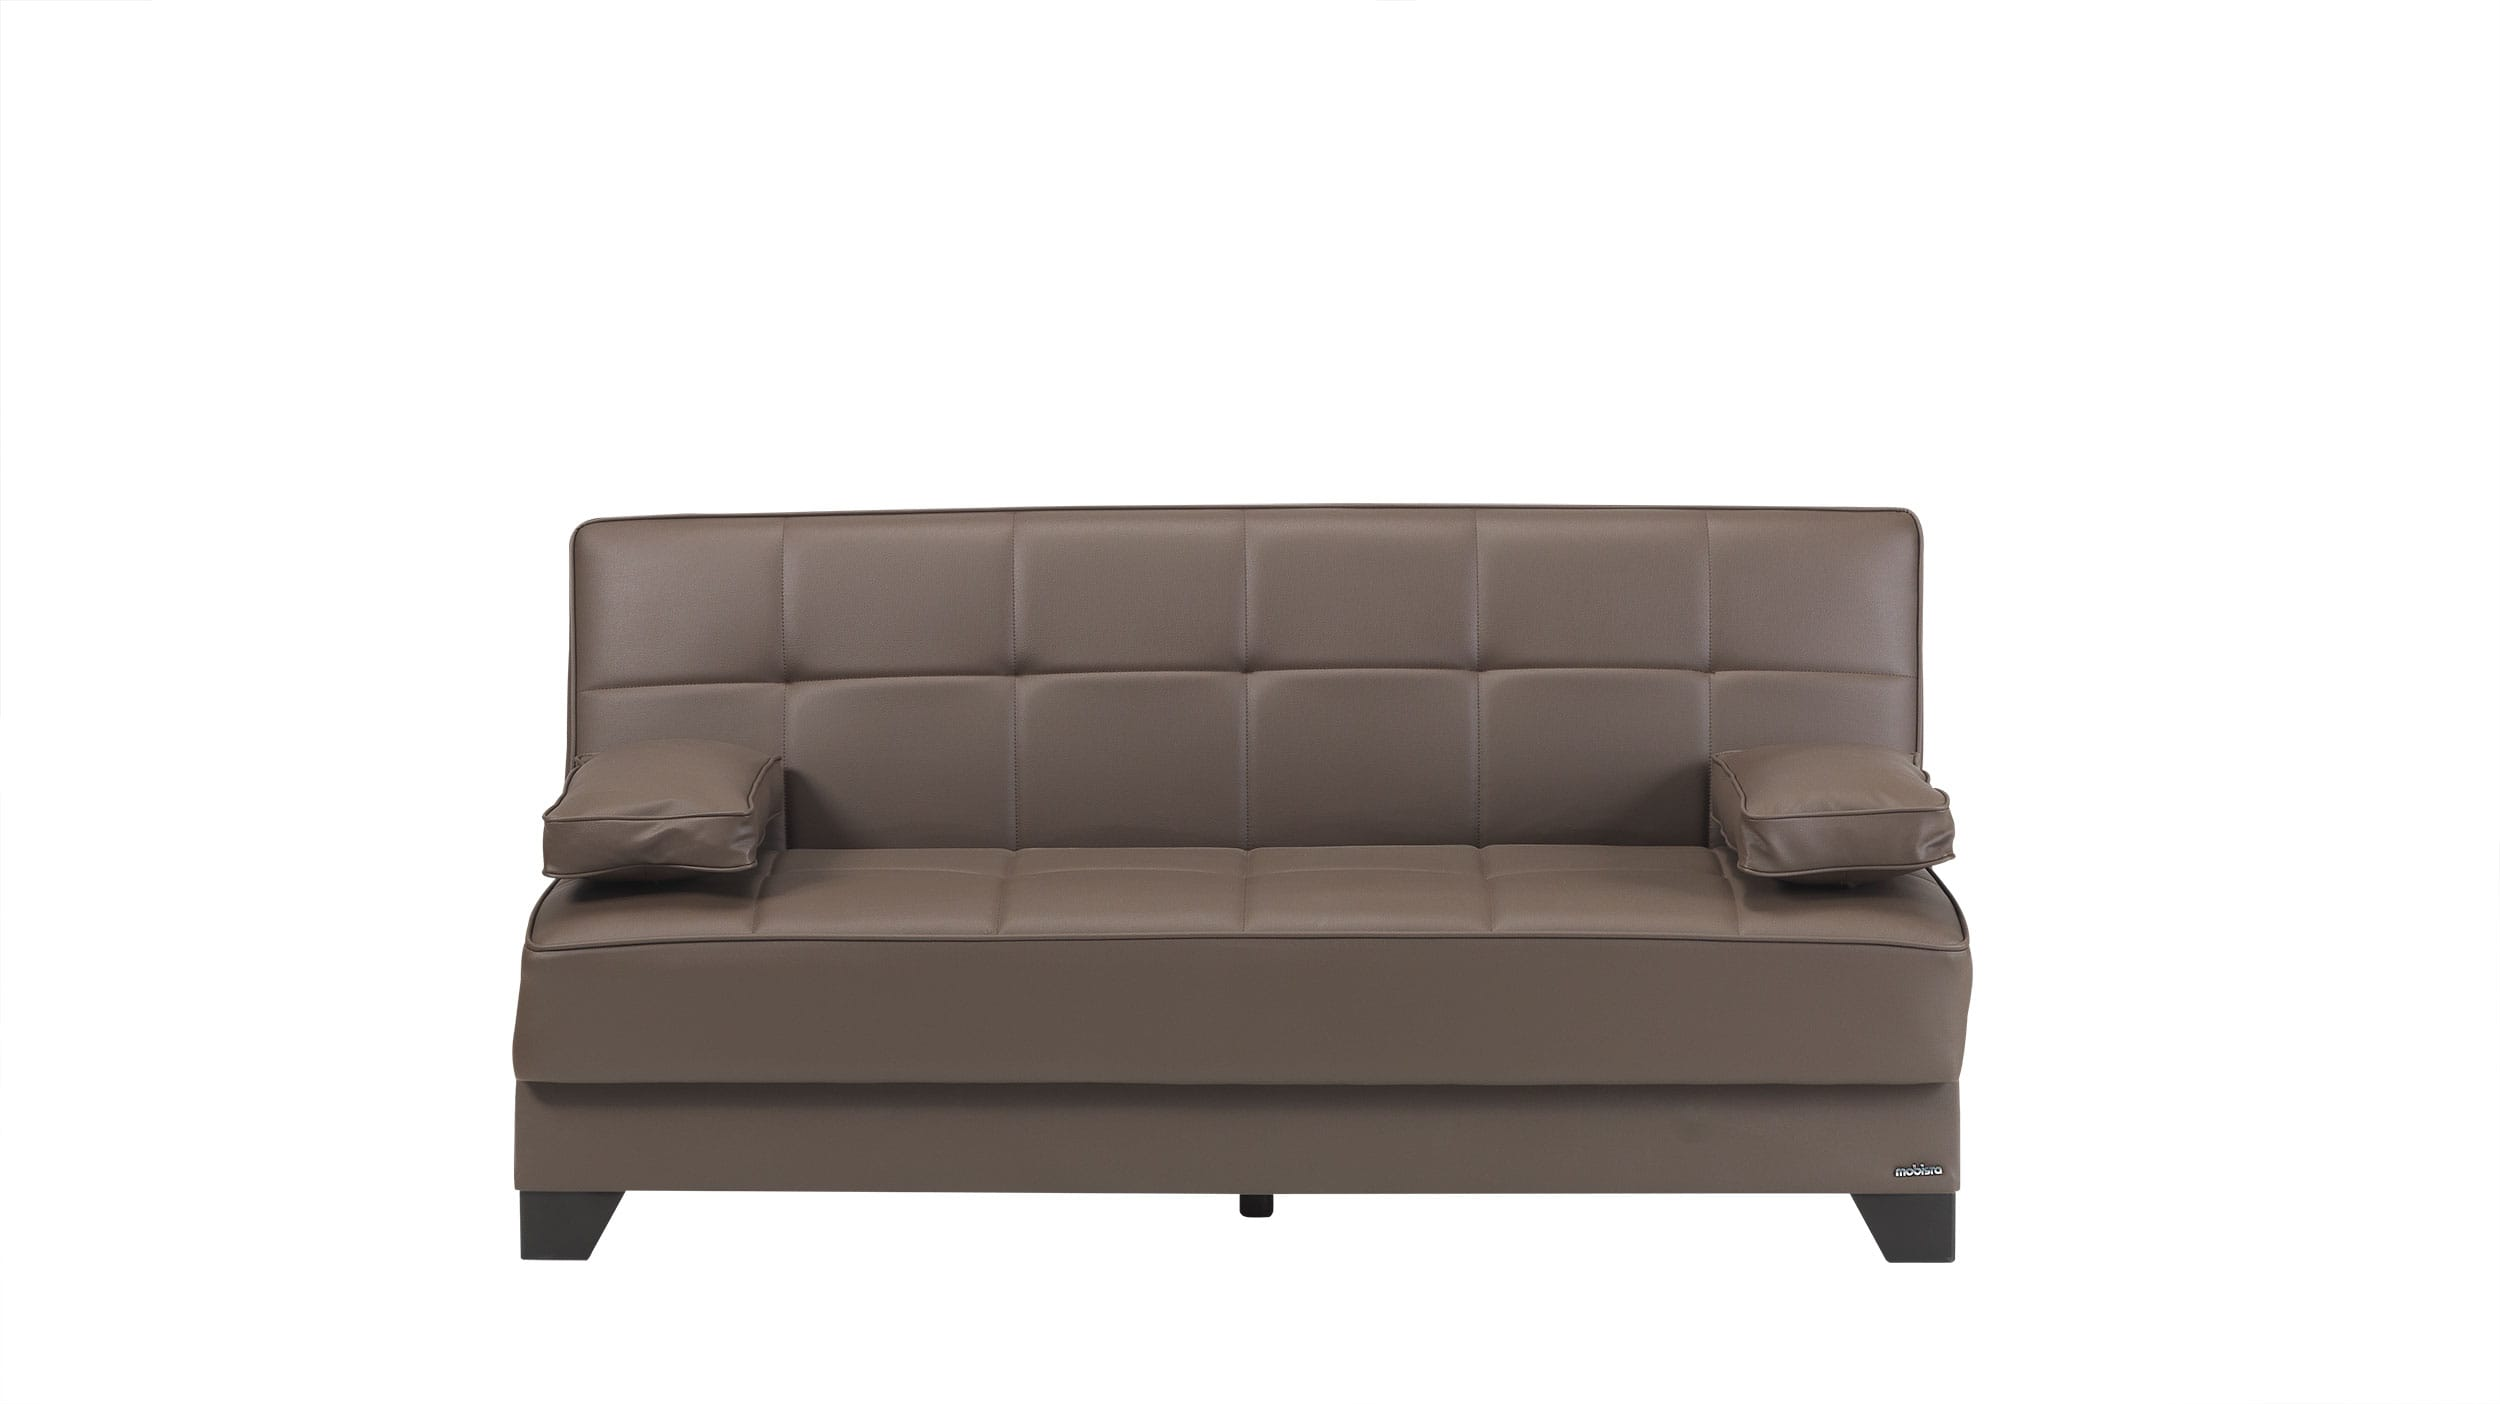 Tribeca Nyc Prestige Brown Sofa Bed